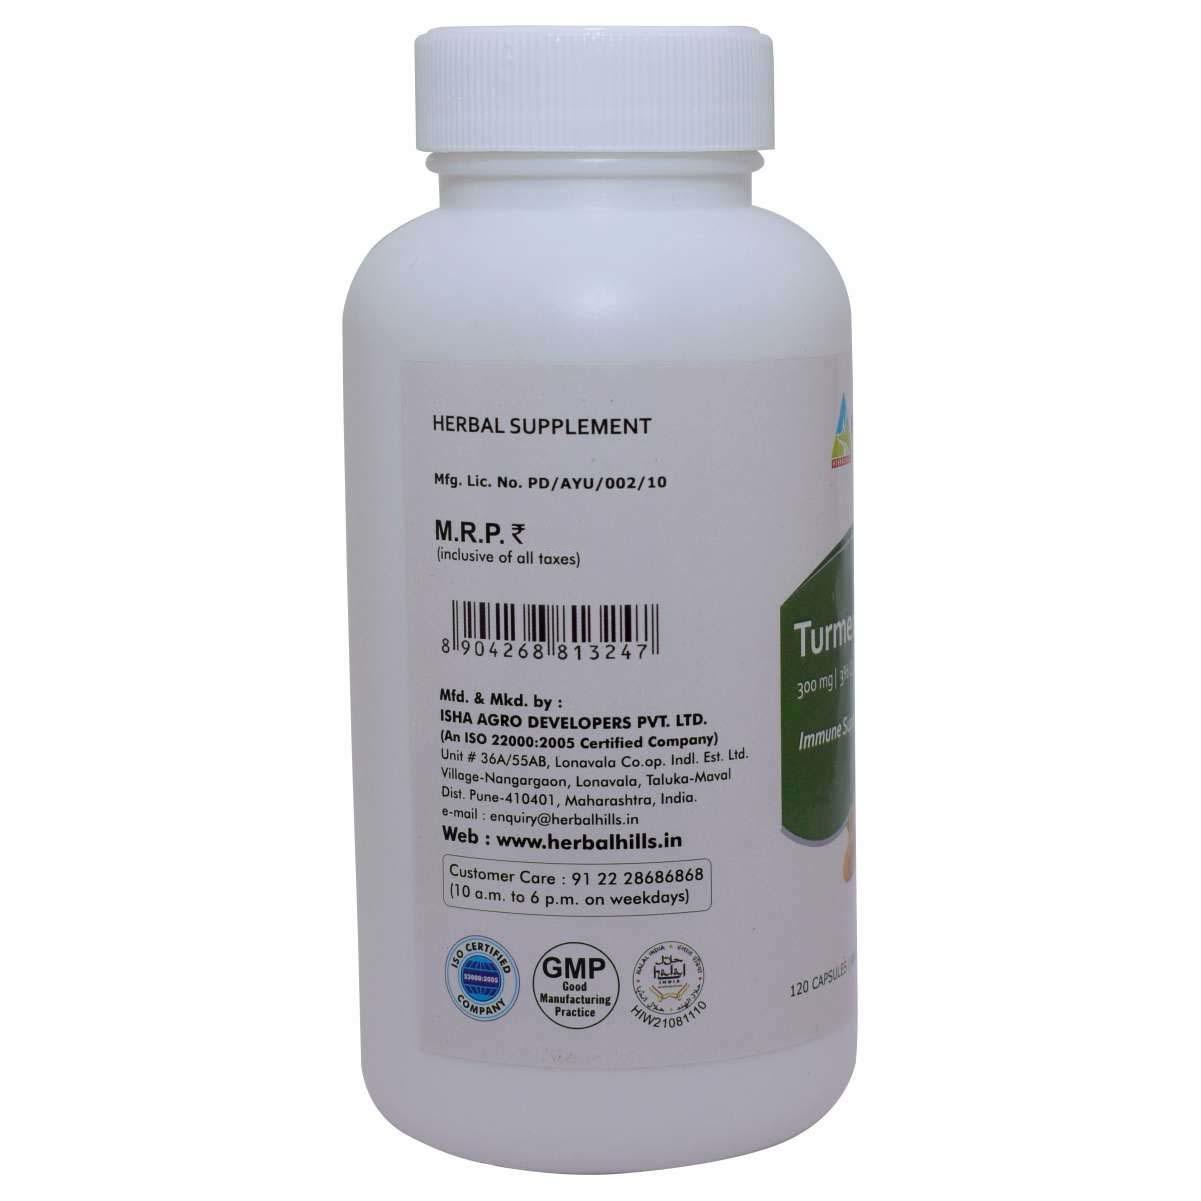 Ayurvedic Turmeric Skin care capsule - Turmerichills